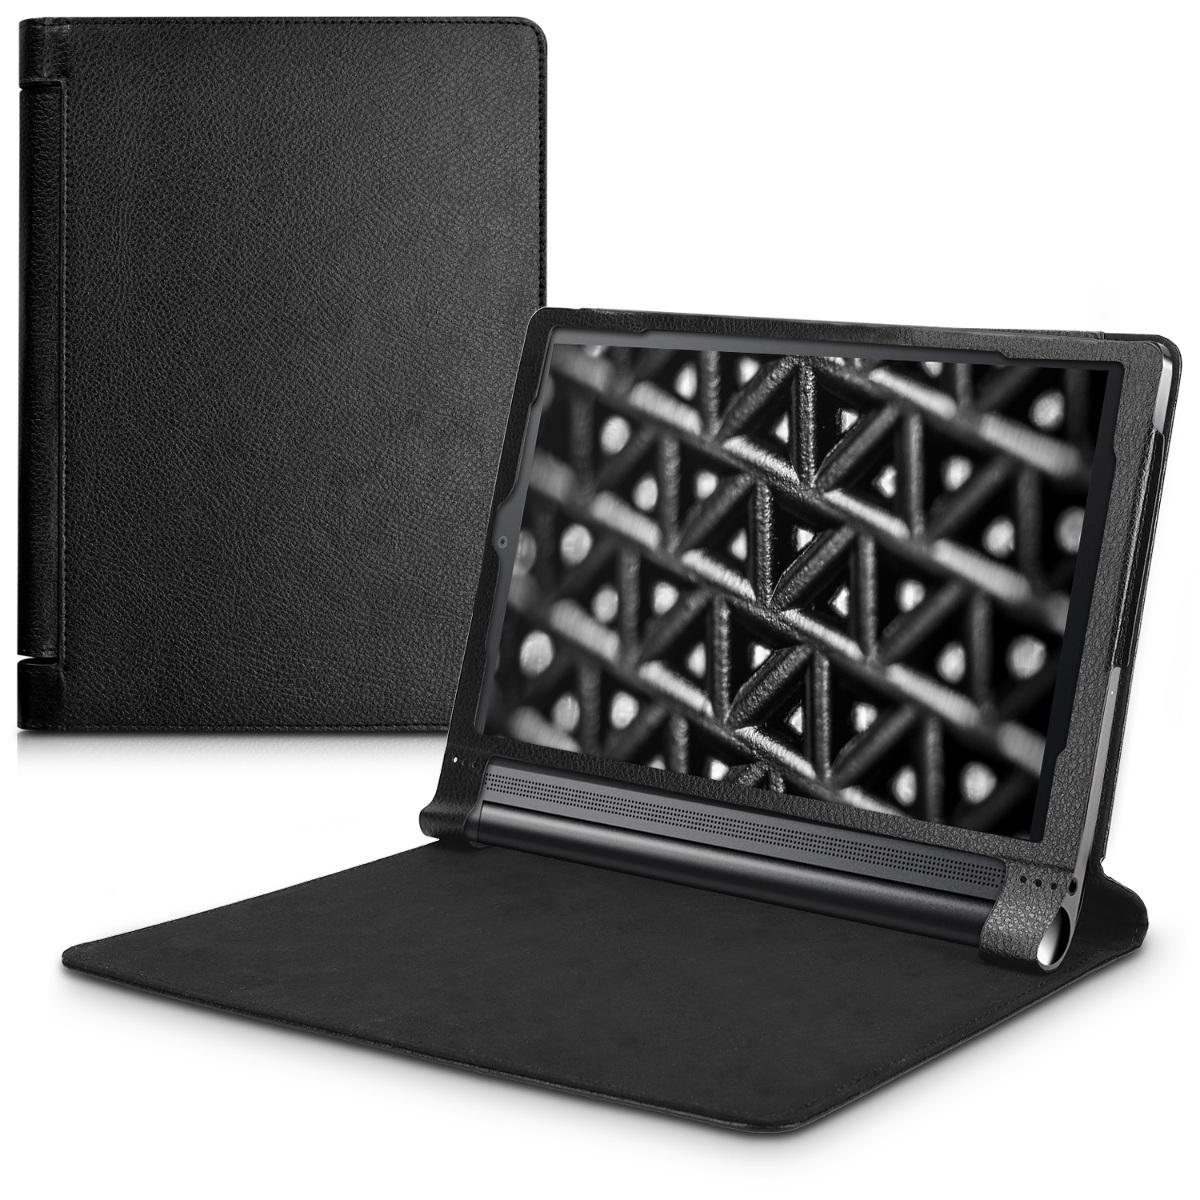 KW Ultra Slim Cover - Θήκη Flip για Lenovo Yoga Tab 3 Plus - Black (40939.01)